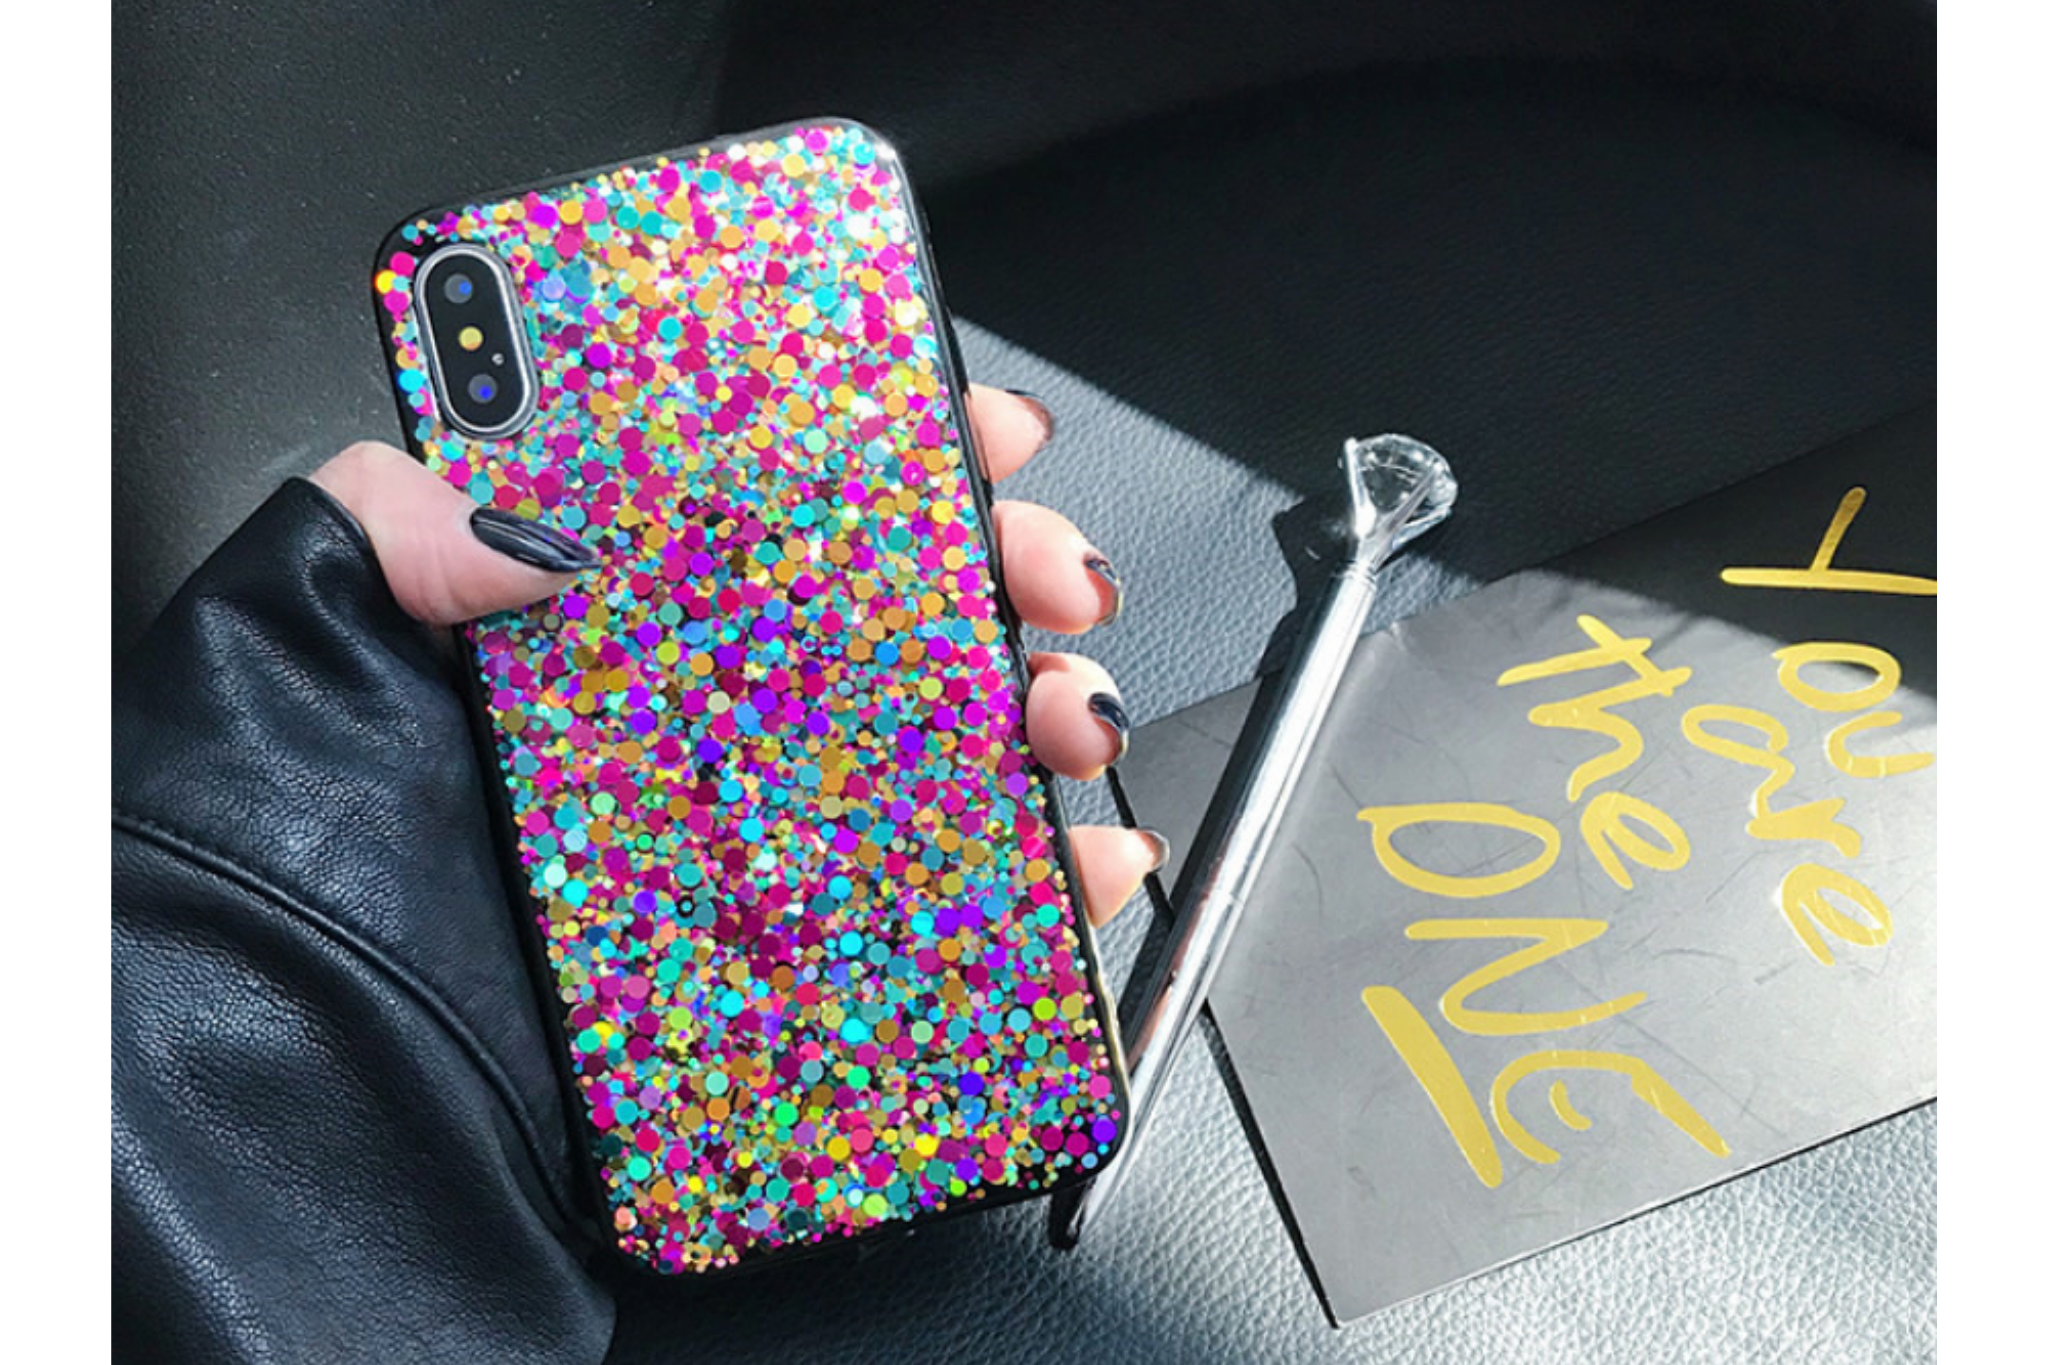 Smartphonehoesje iPhone X / XS   Bling met glitters   Multicolor